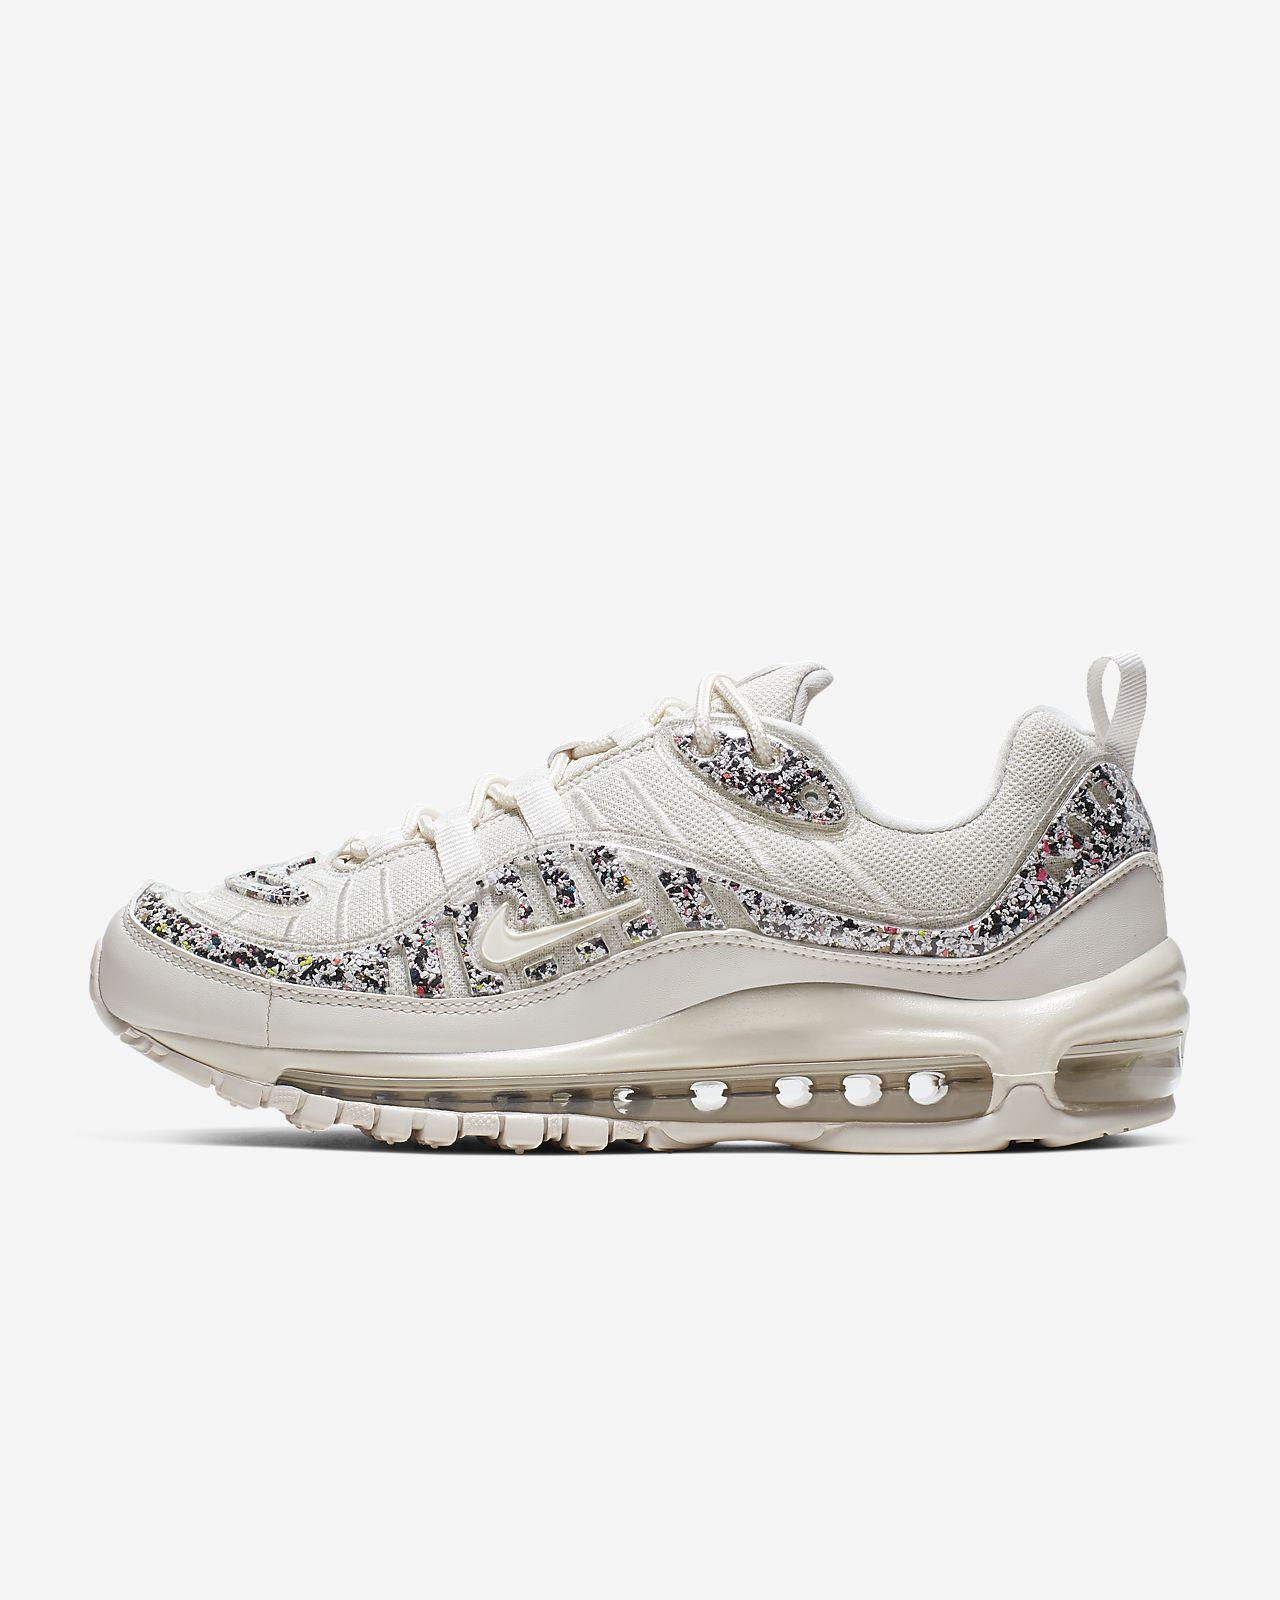 Nike Air Max 98 LX sko til dame